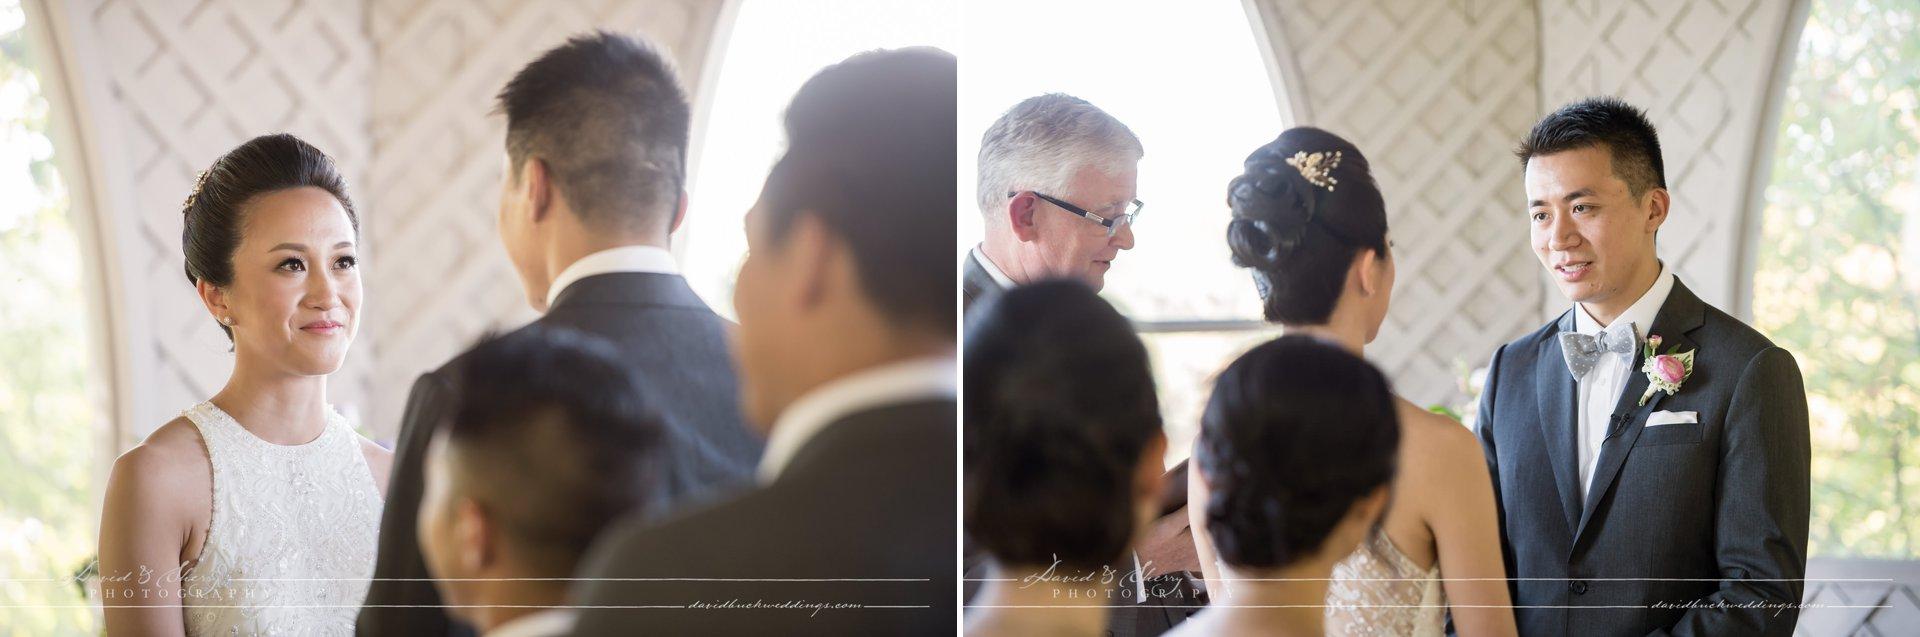 waterstone-estate-wedding-david-sherry-photography-simon-crystal-020